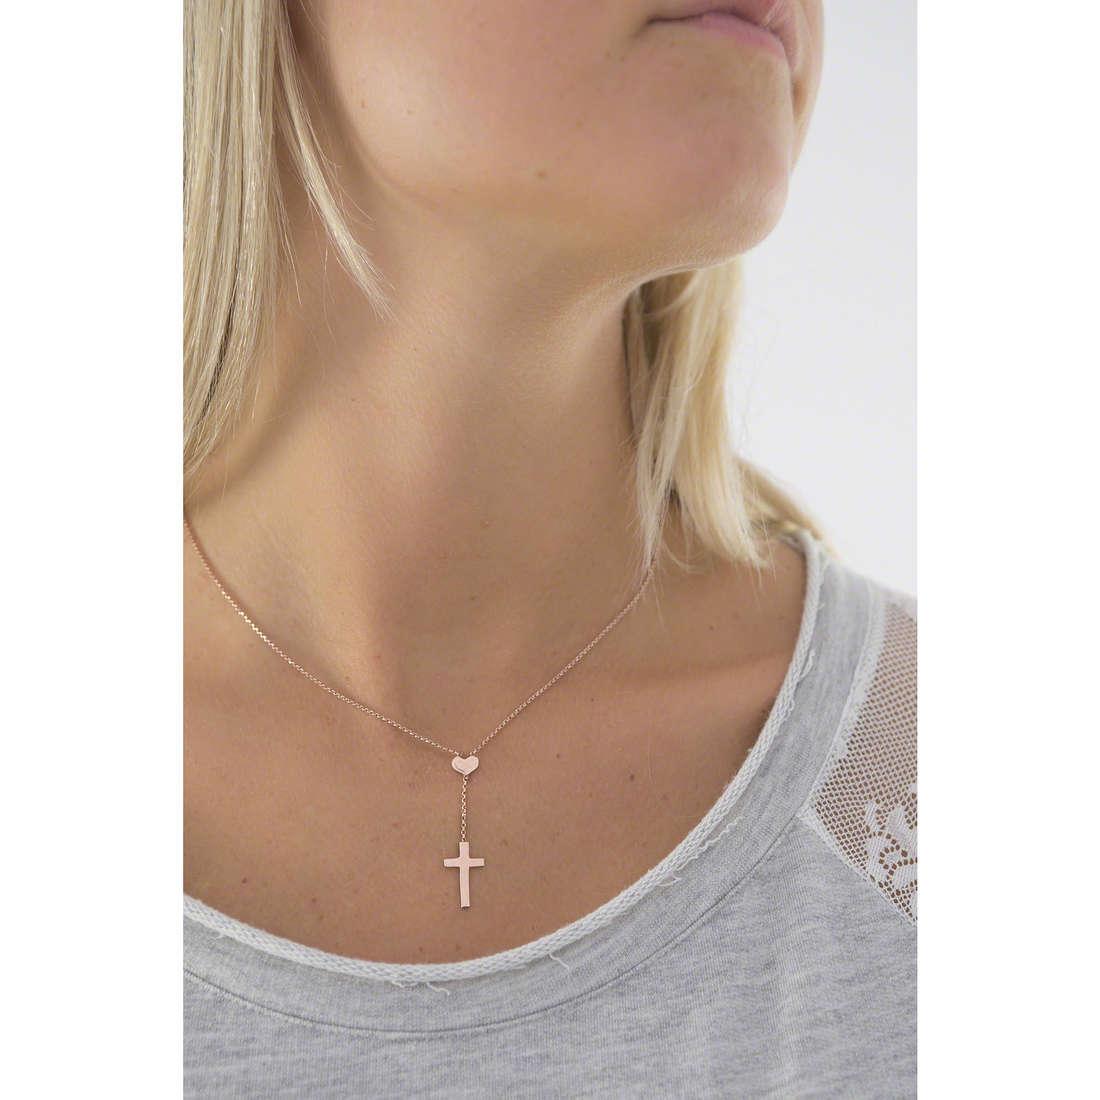 Amen colliers Croce femme CLCHR indosso